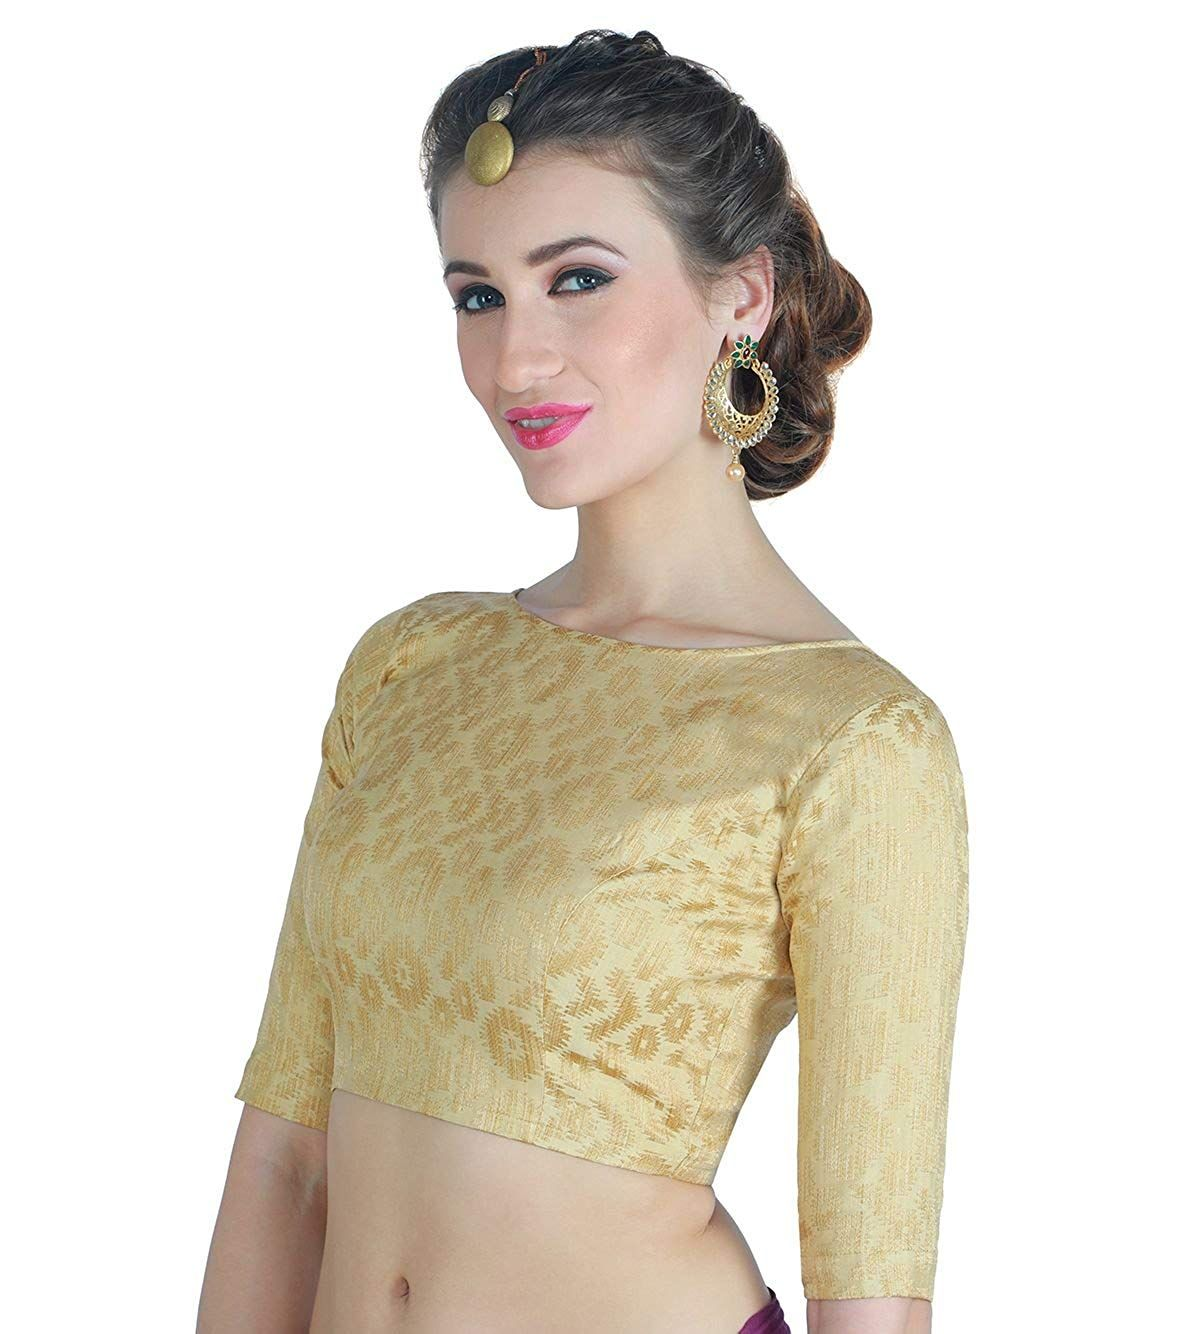 6beefae8f55b18 Studio Shringaar Women's Golden Brocade Saree Blouse.: Amazon.in: Clothing  & Accessories